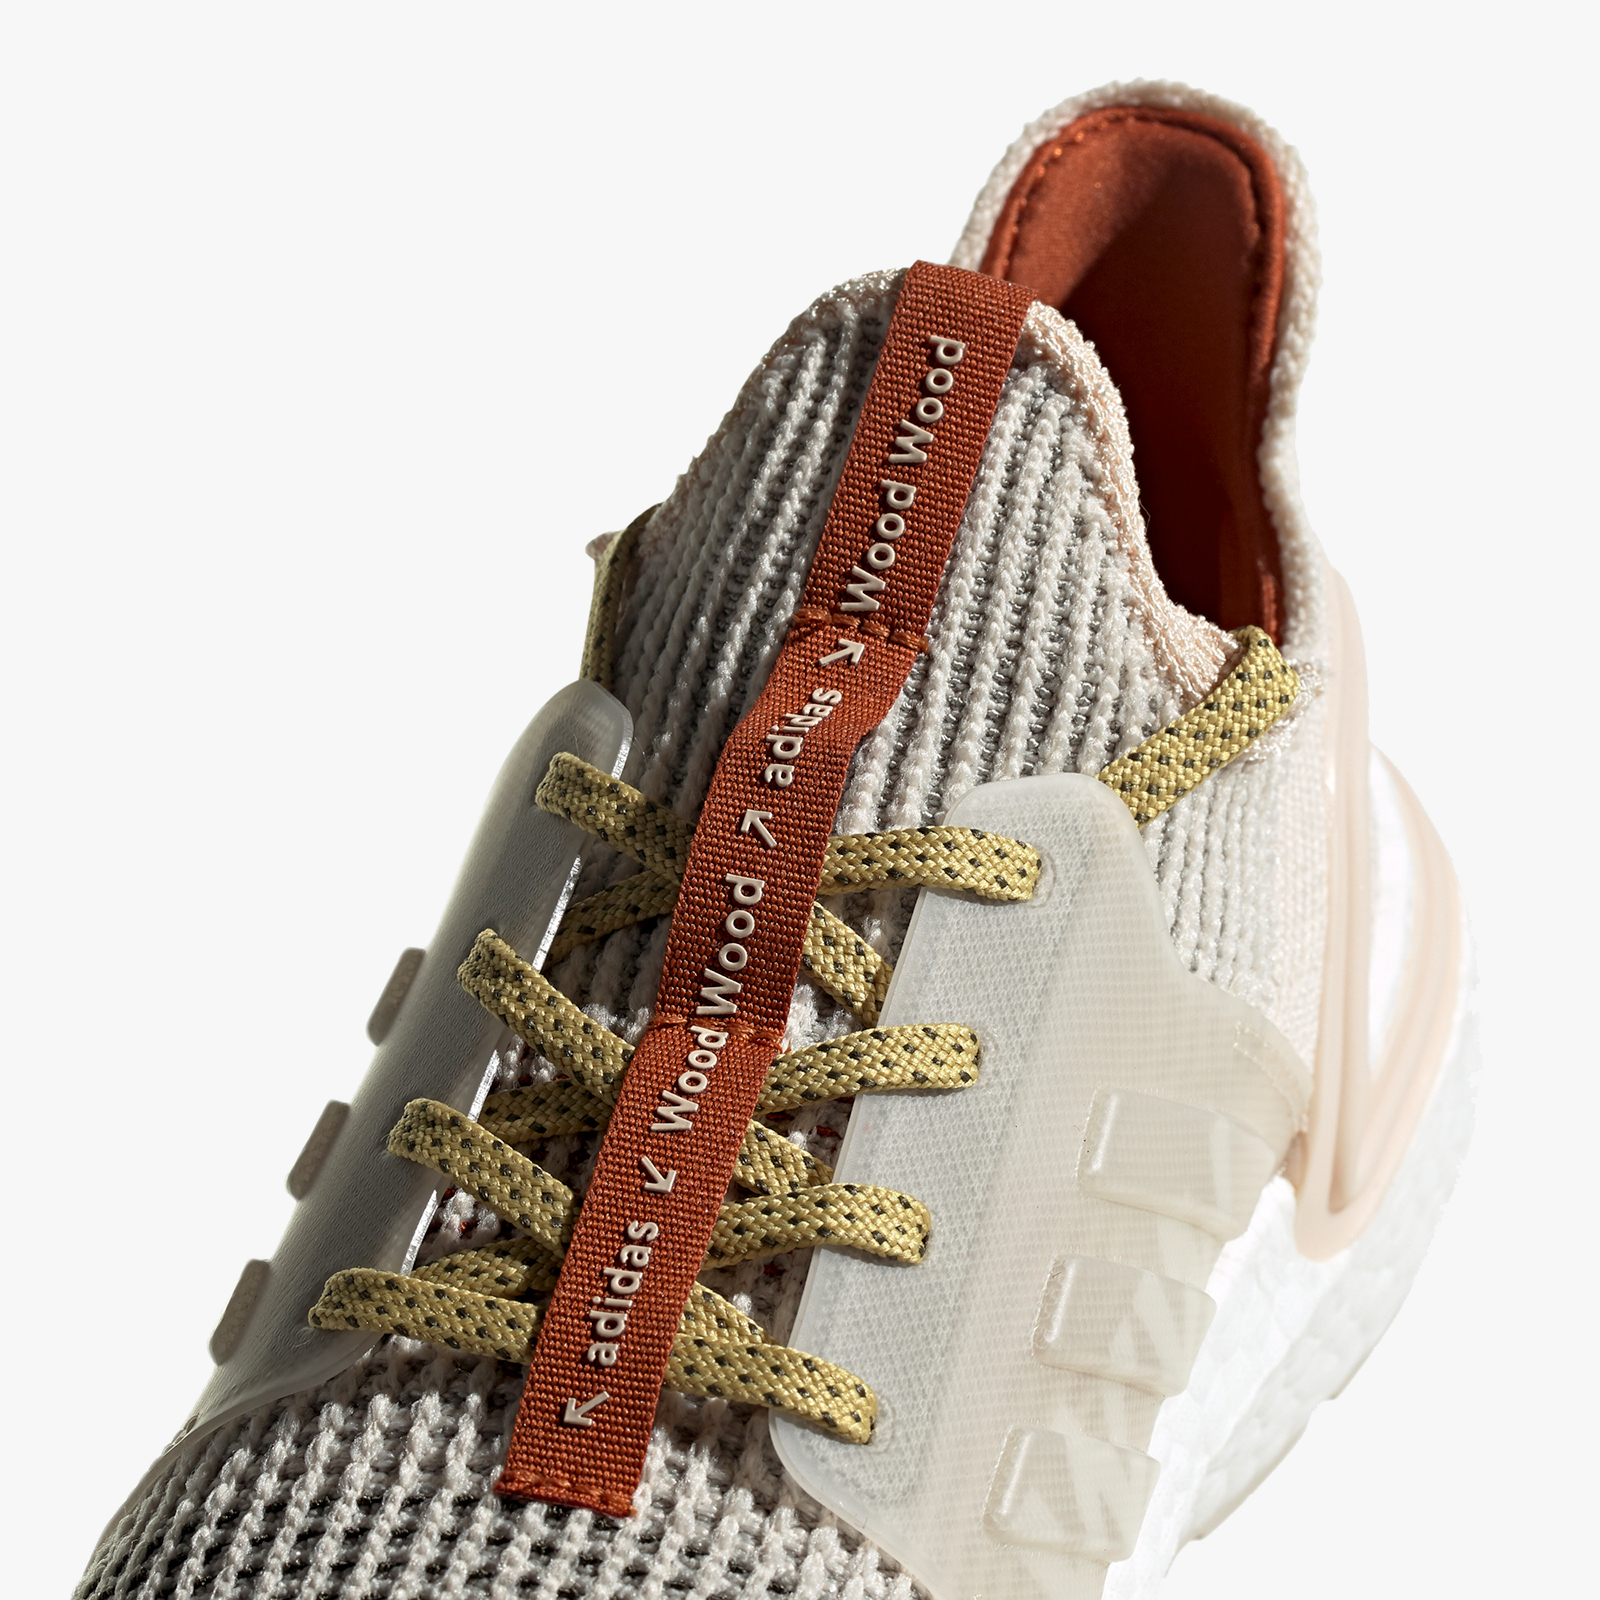 adidas Ultraboost 19 x Wood Wood Eg1727 Sneakersnstuff